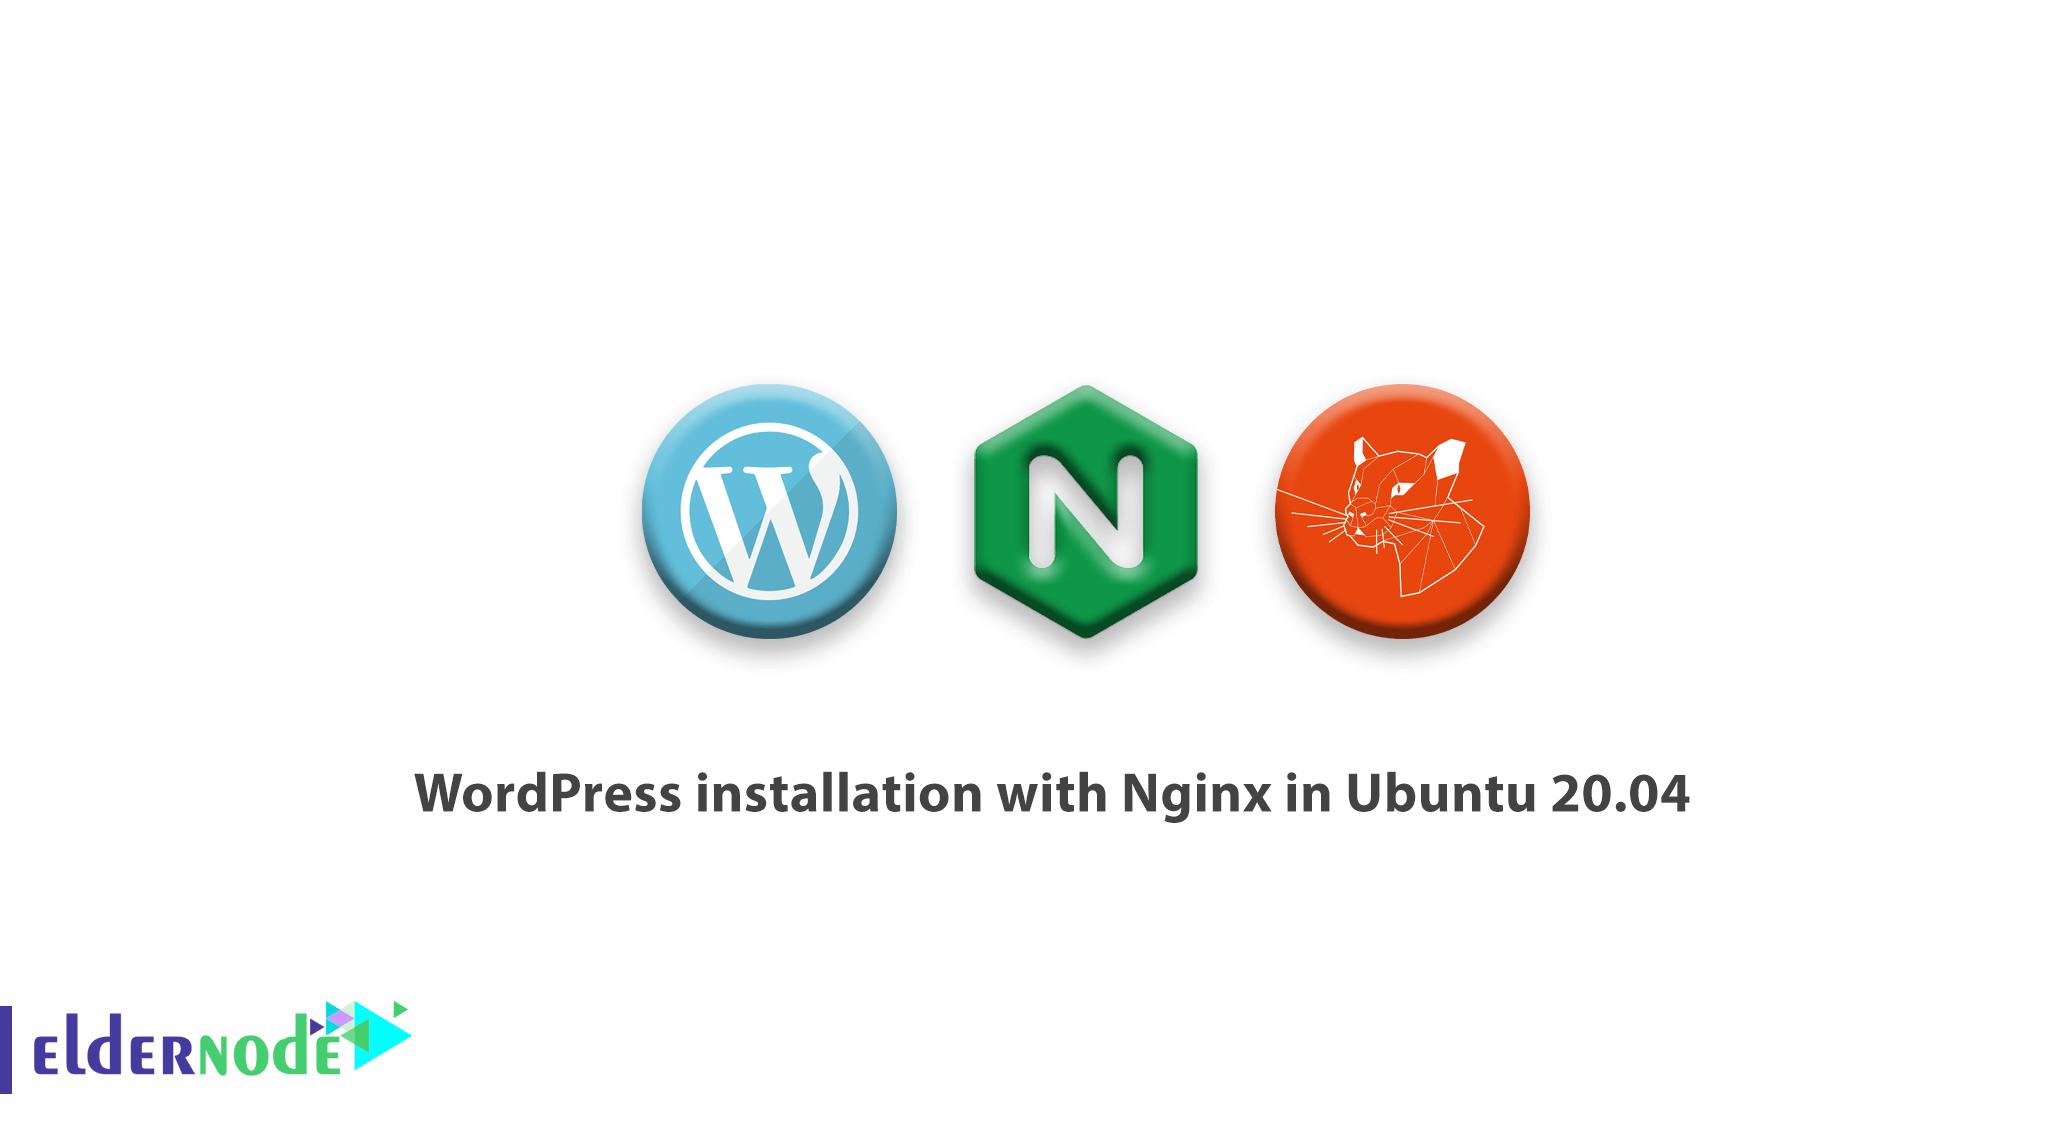 Tutorial WordPress installation with Nginx in Ubuntu 20.04